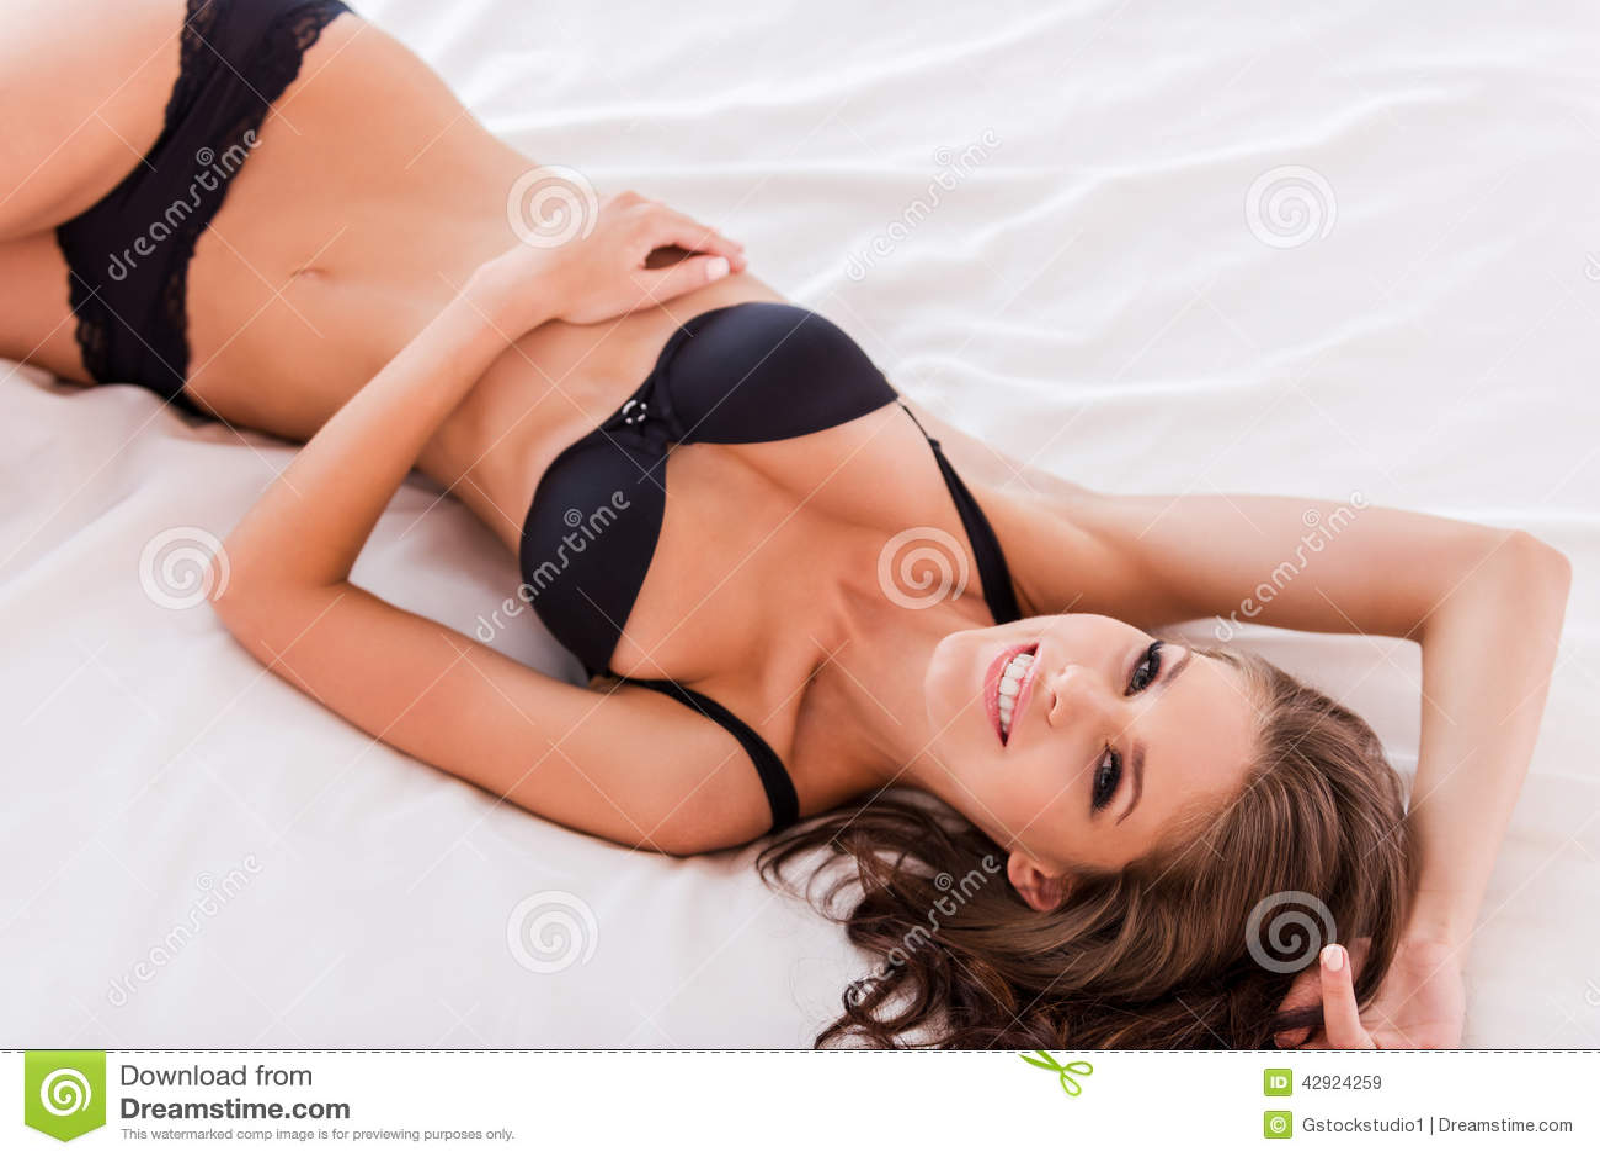 Ramya nambeesan hot nude gallery